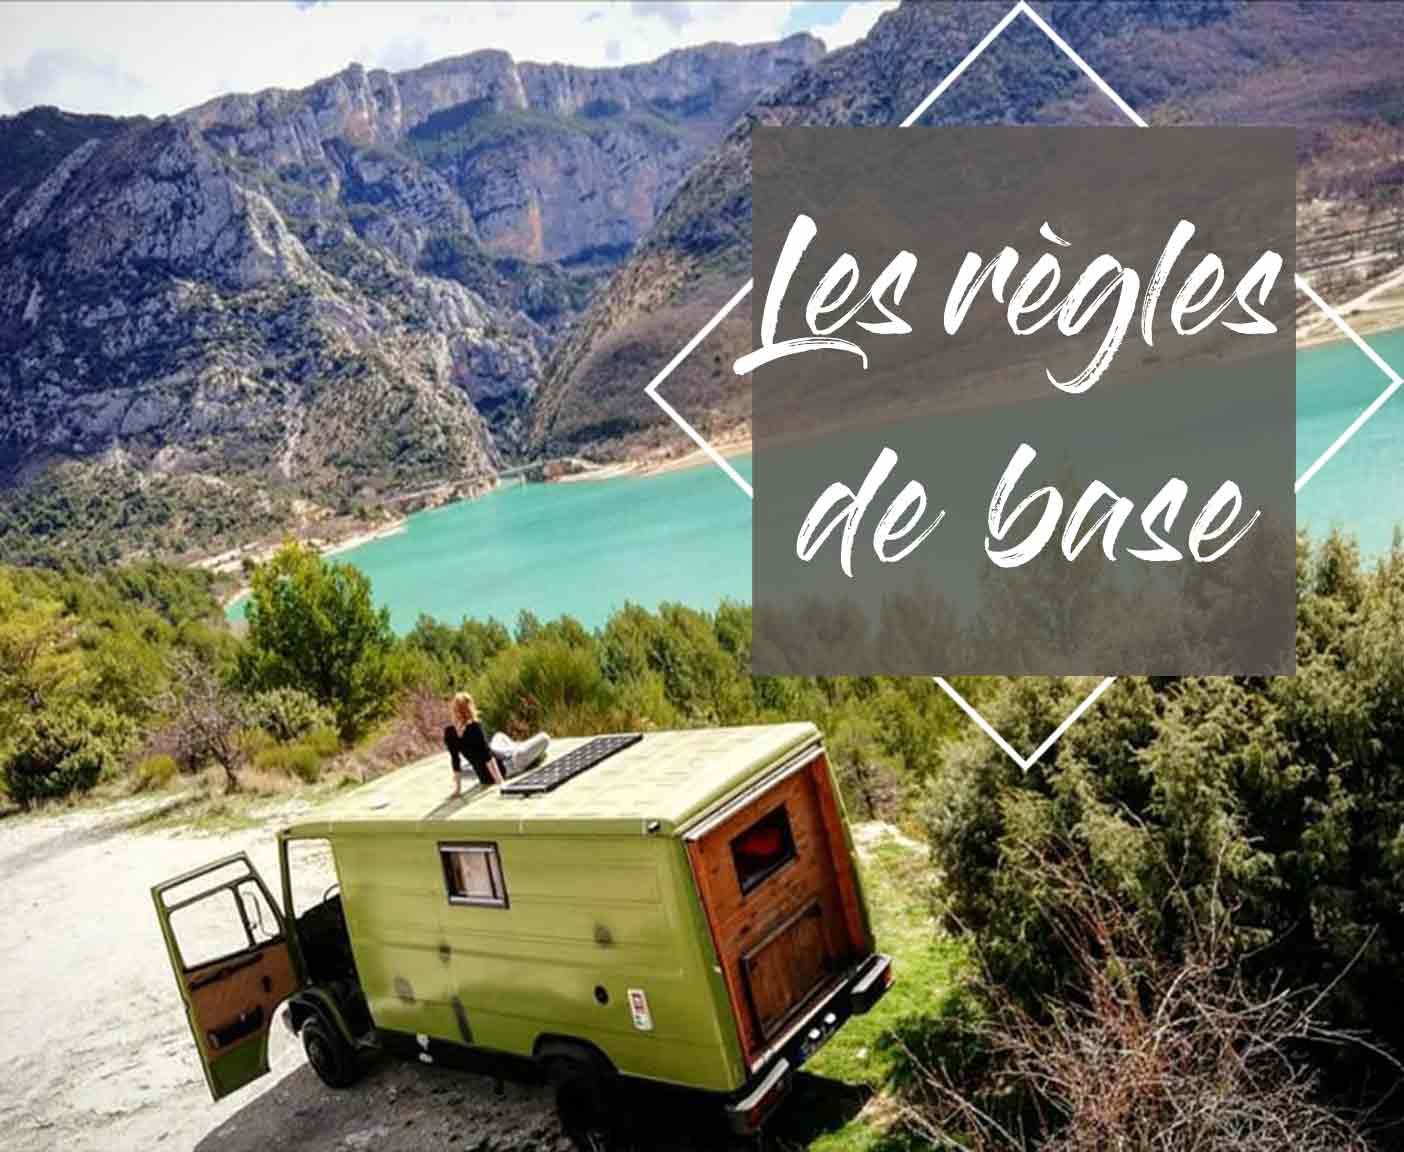 camping-sauvage-regles-reglementation-vanlife-roadtrip-spot-application